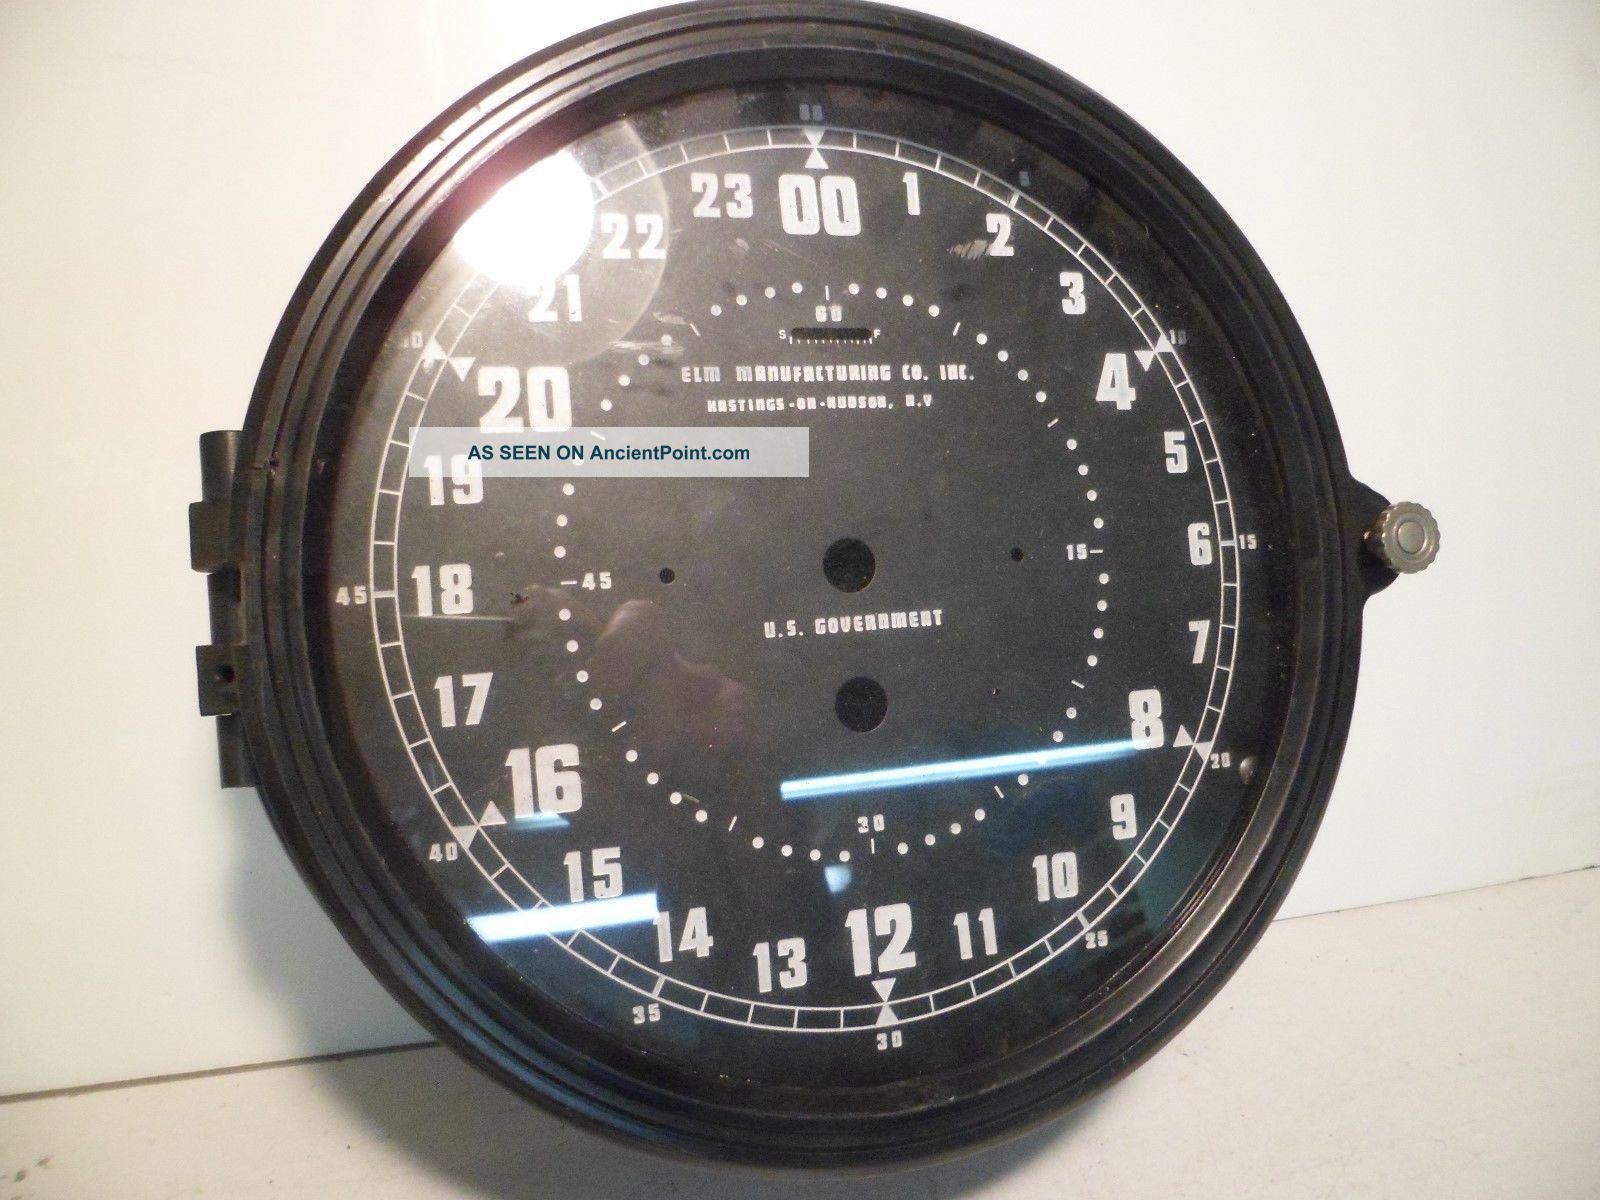 Nos 8 1/2 Inch Elm Manufacturing Military Navy Plastic Clock Case W/ 24 Hr Dial Clocks photo